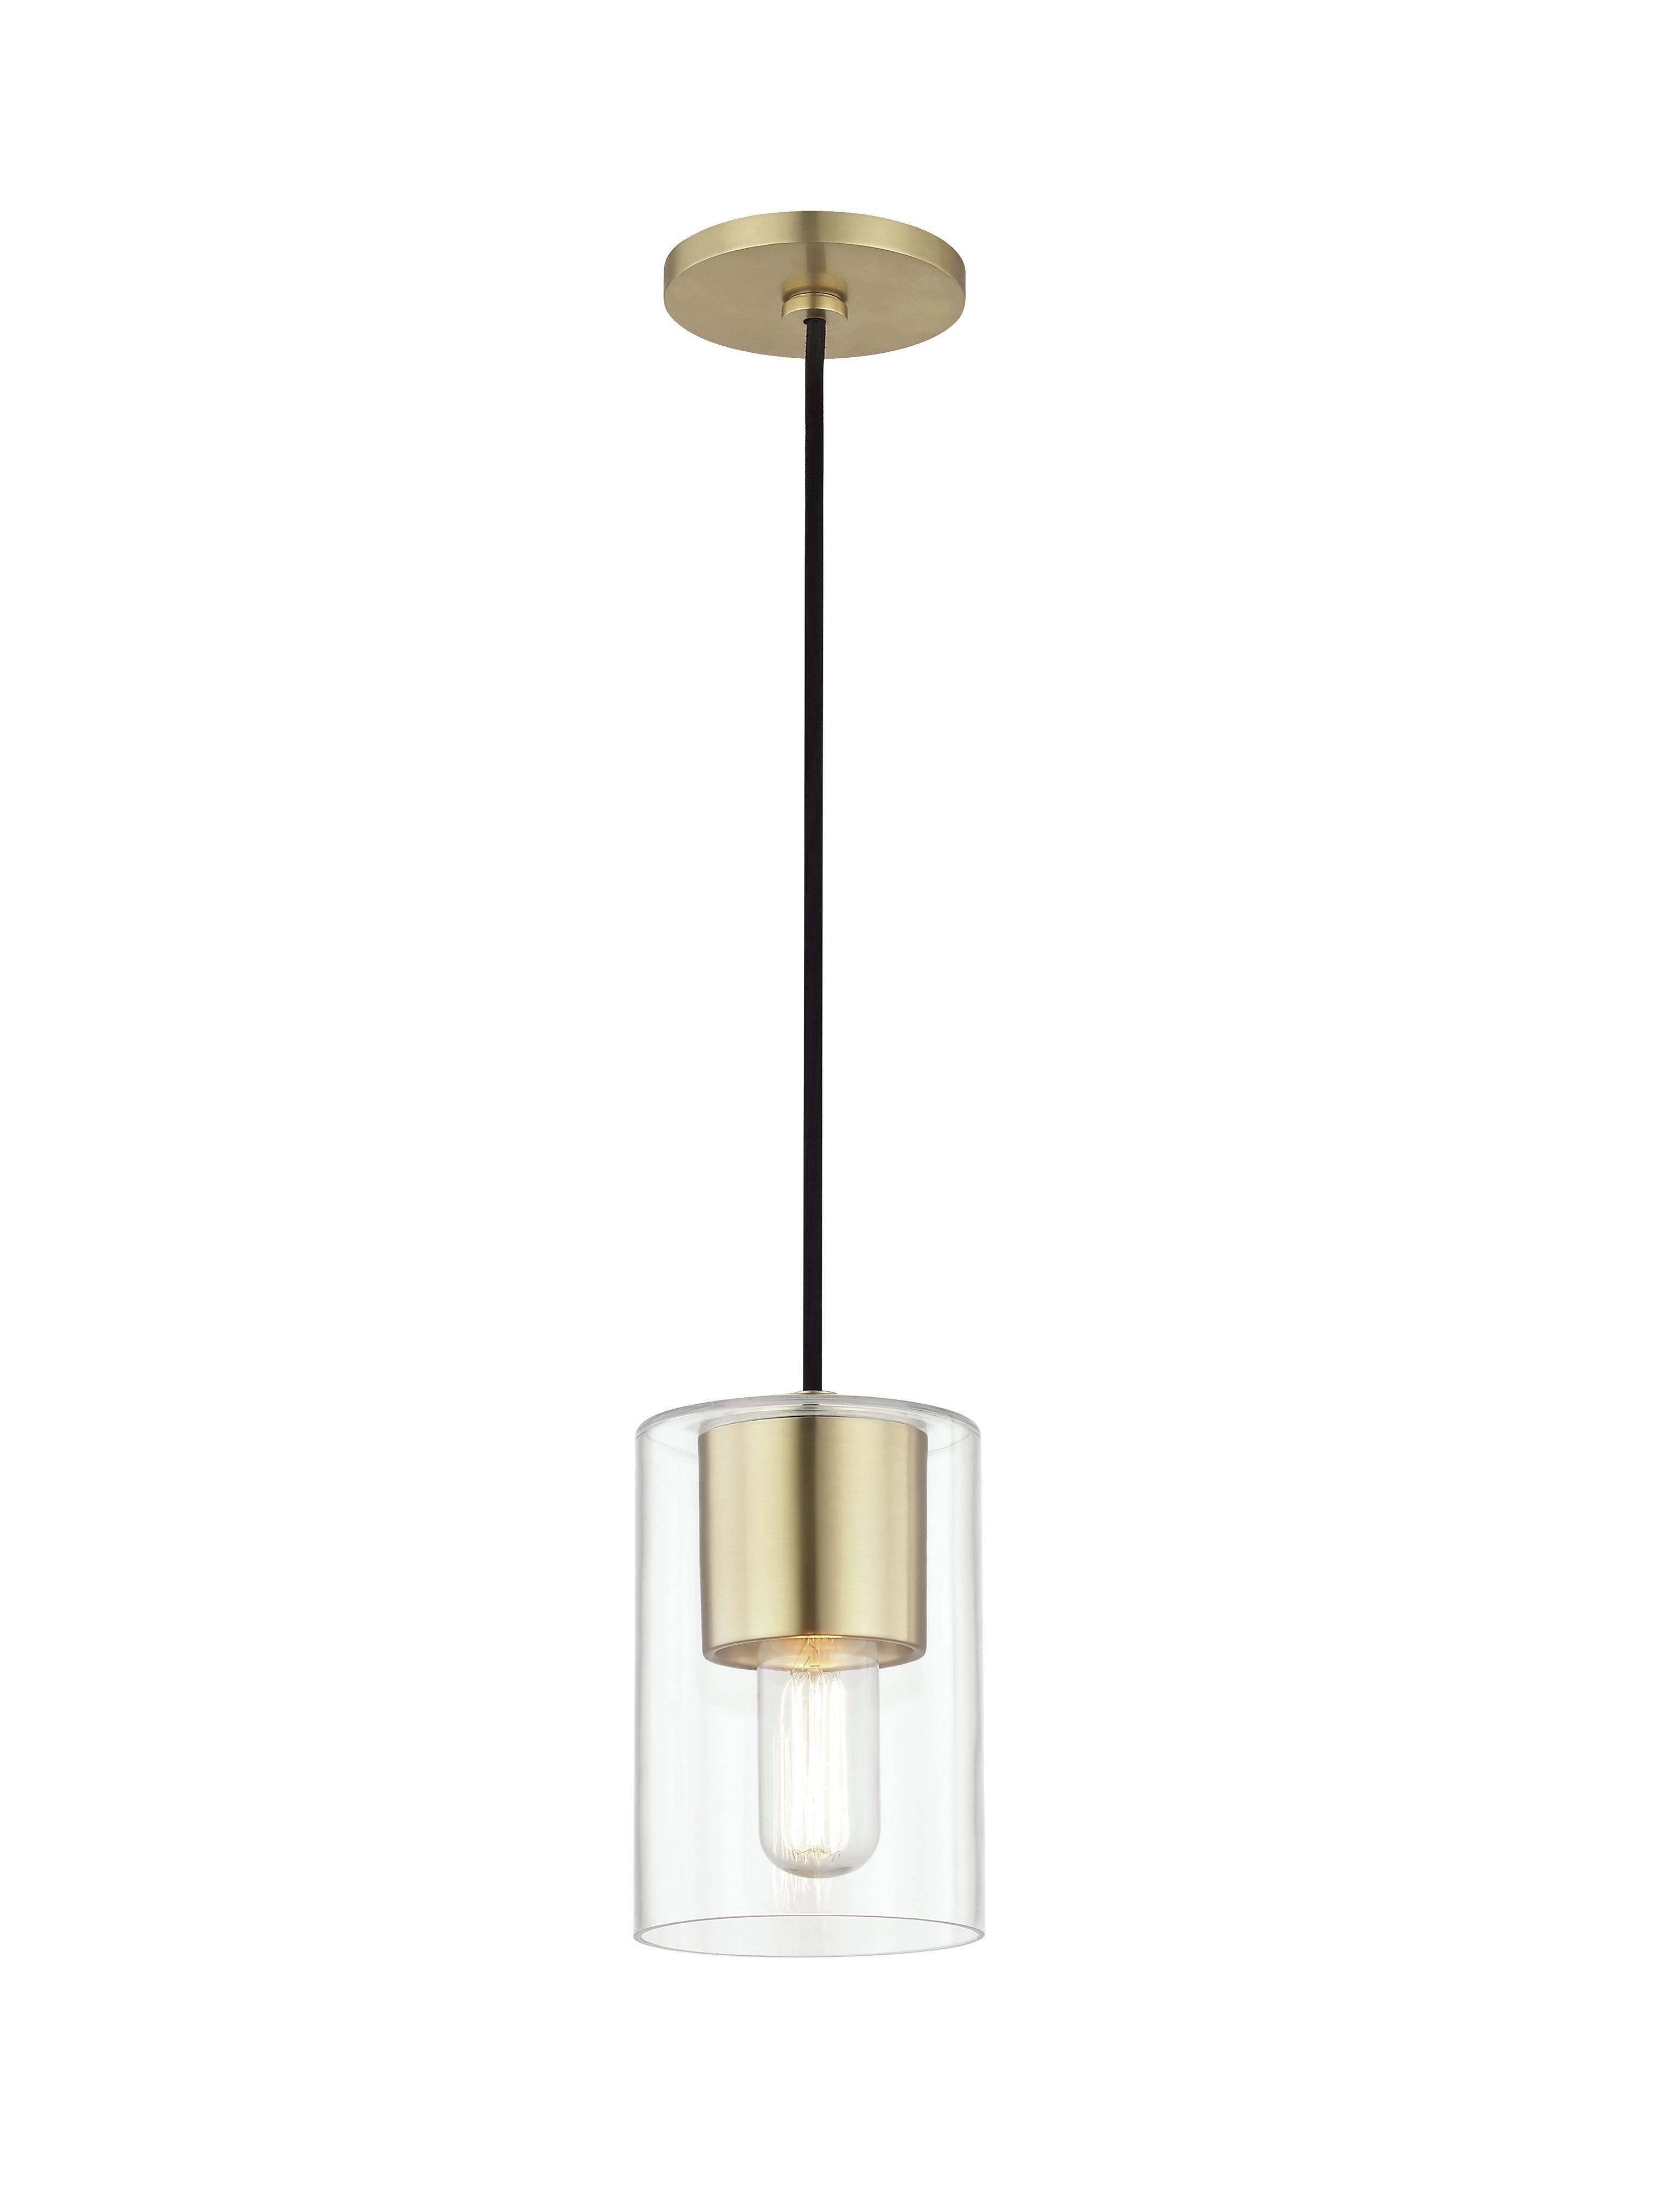 Damp Location Pendant Lighting | Joss & Main with Bainbridge 1-Light Single Cylinder Pendants (Image 9 of 30)